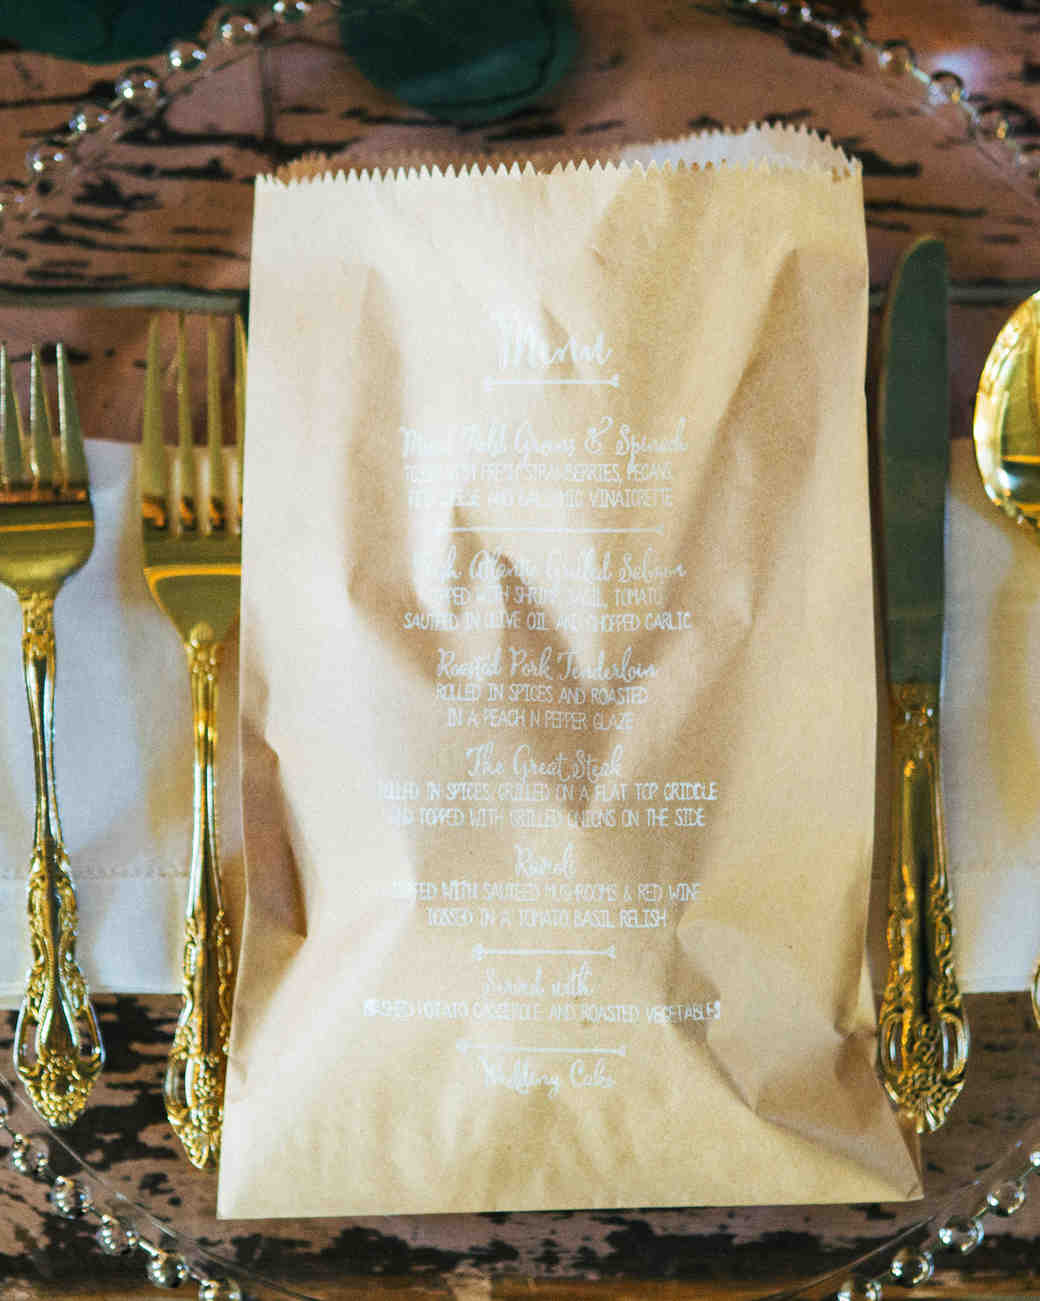 leah-michael-wedding-placesetting-1665-s111861-0515.jpg